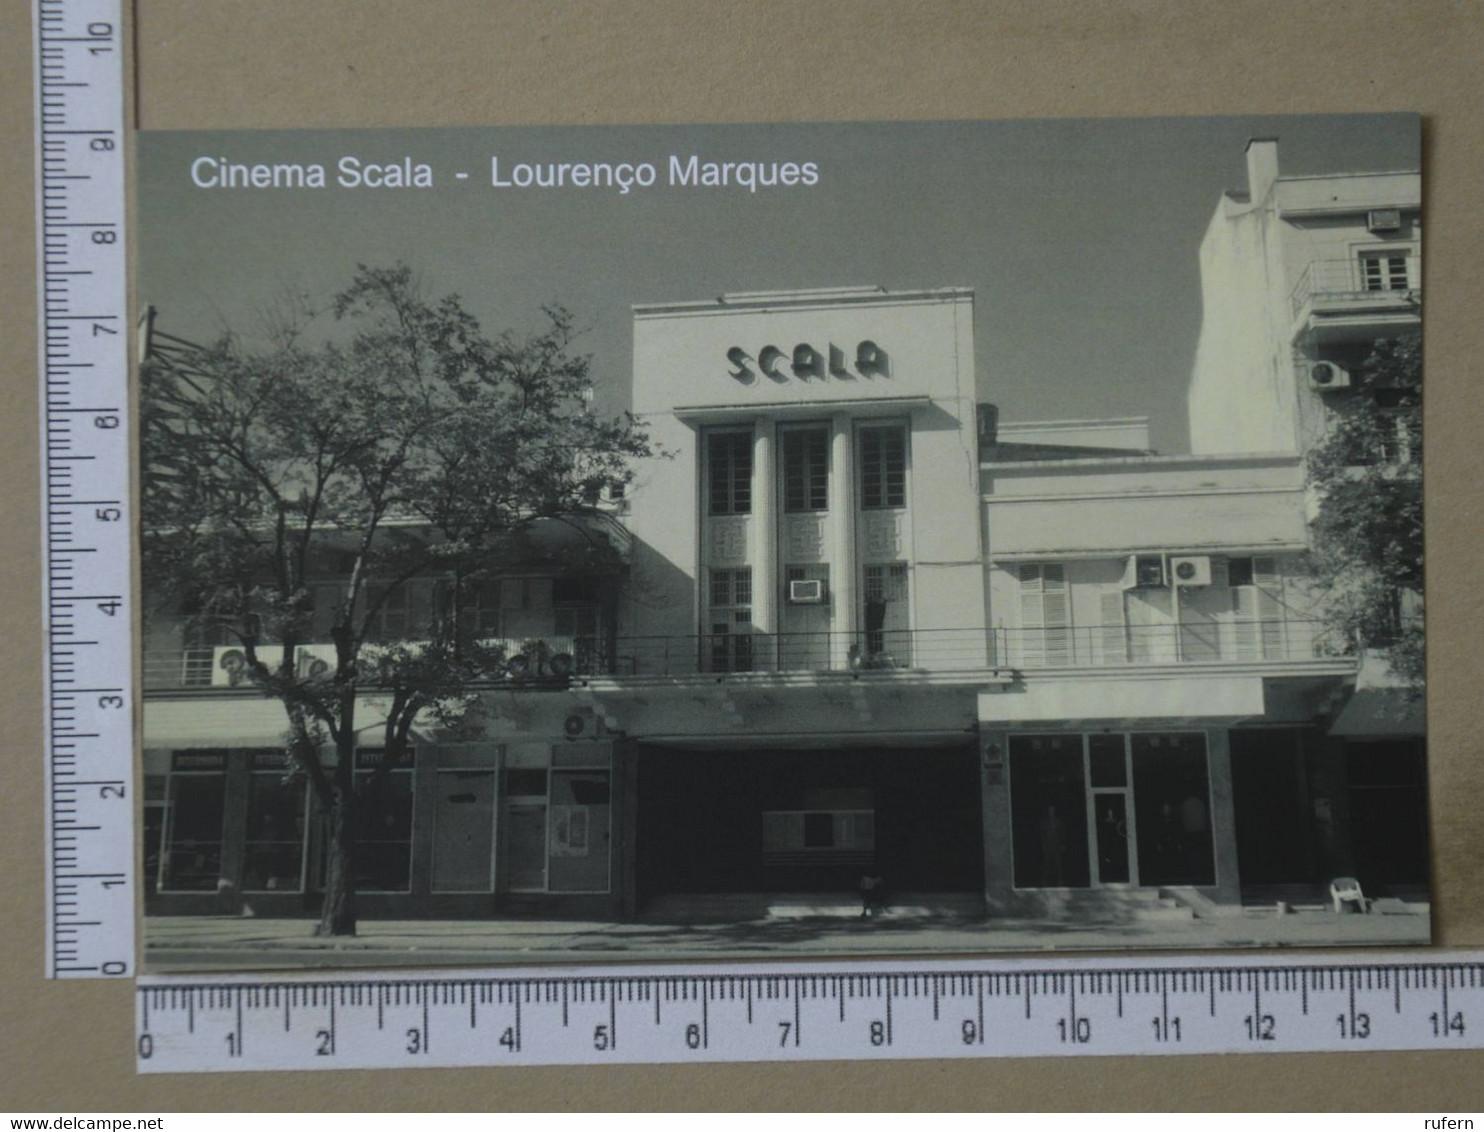 MOZAMBIQUE - CINEMA SCALA -  LOURENÇO MARQUES -   2 SCANS  - (Nº42578) - Mozambique